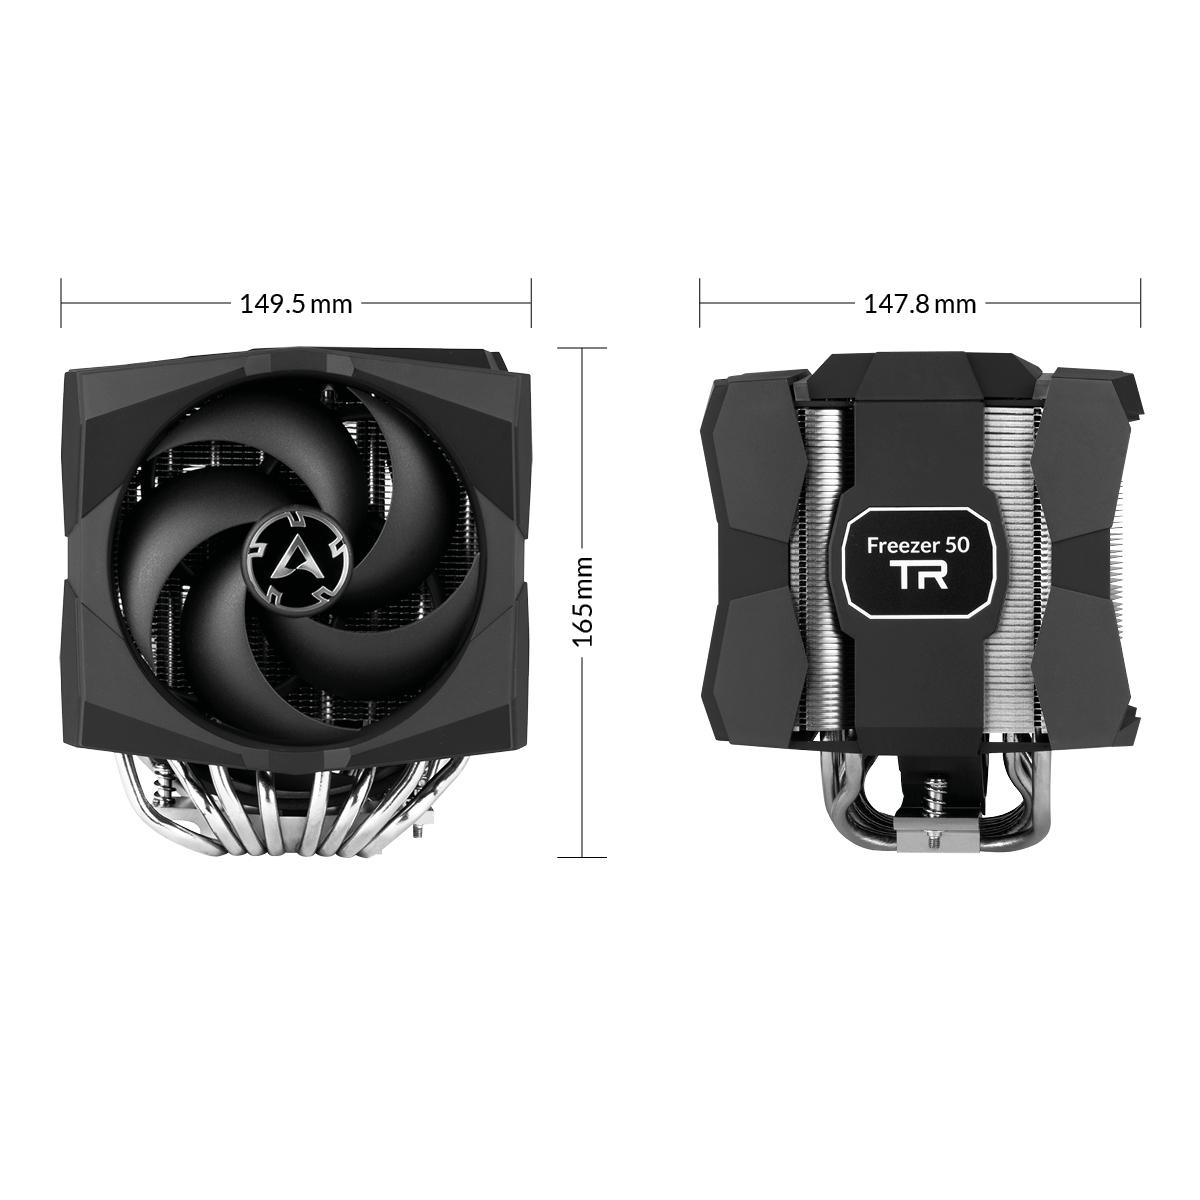 Freezer 50 TR inkl. A-RGB Controller